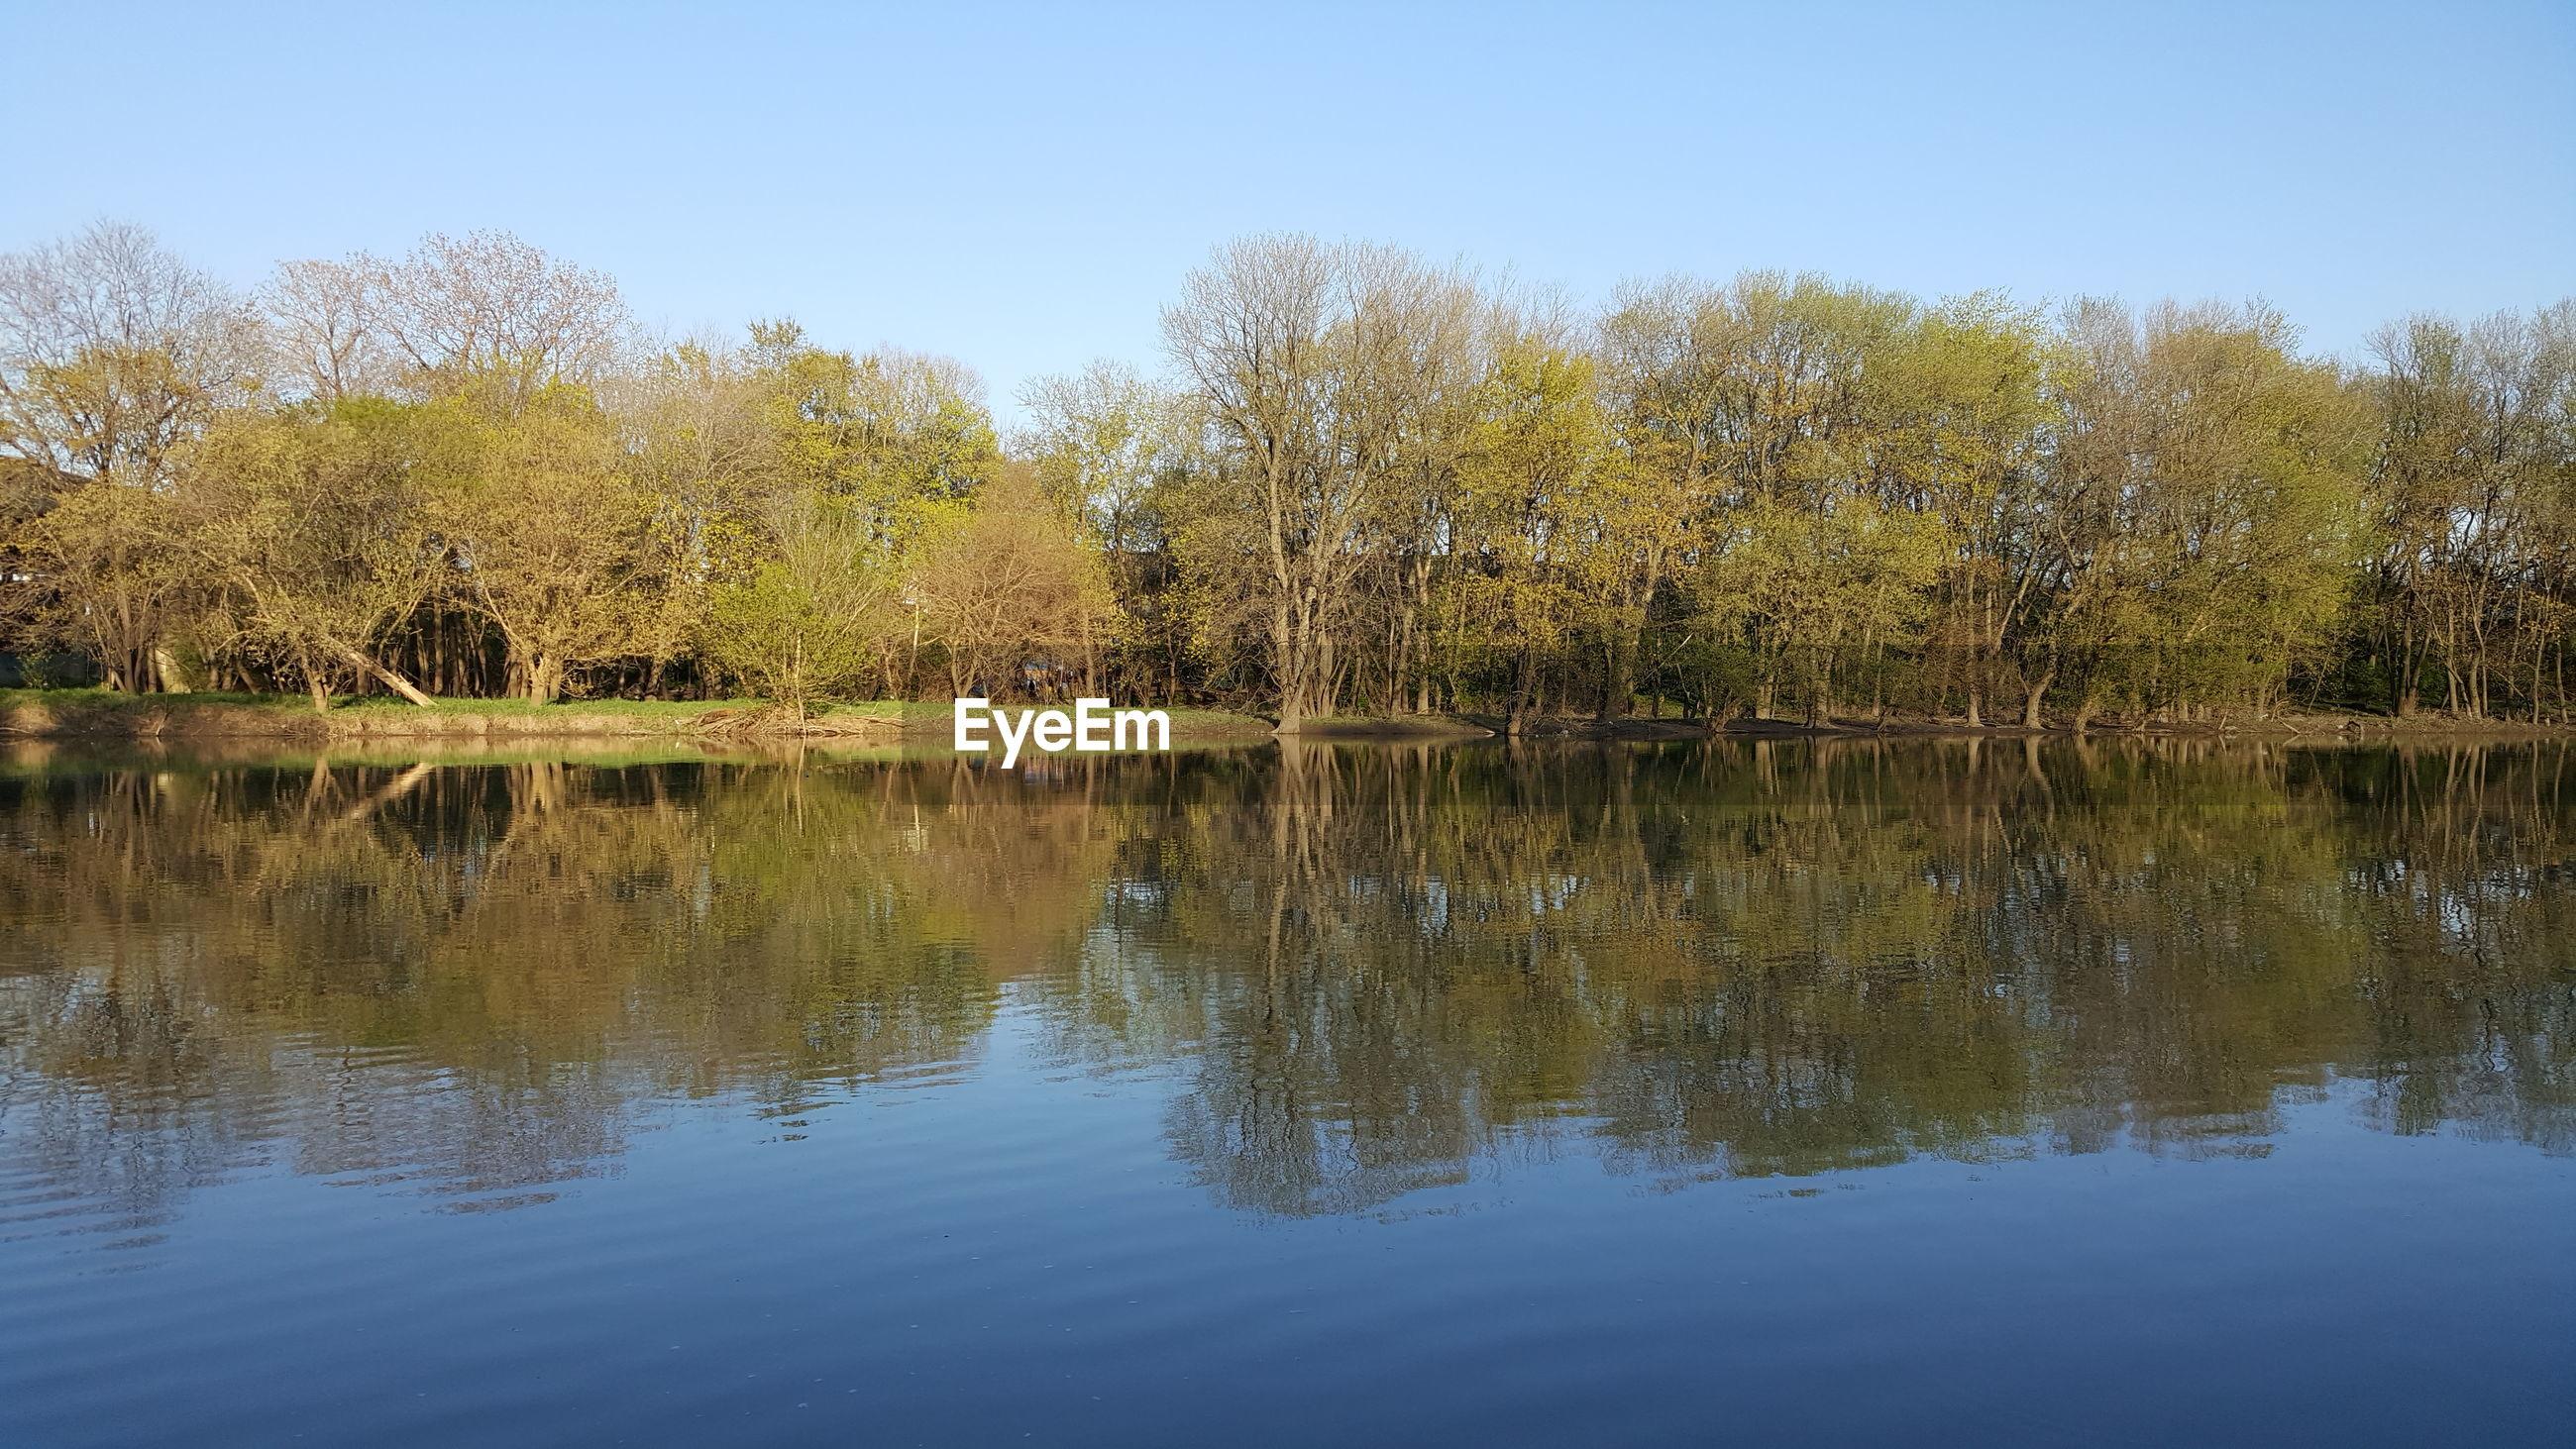 SCENIC VIEW OF CALM LAKE